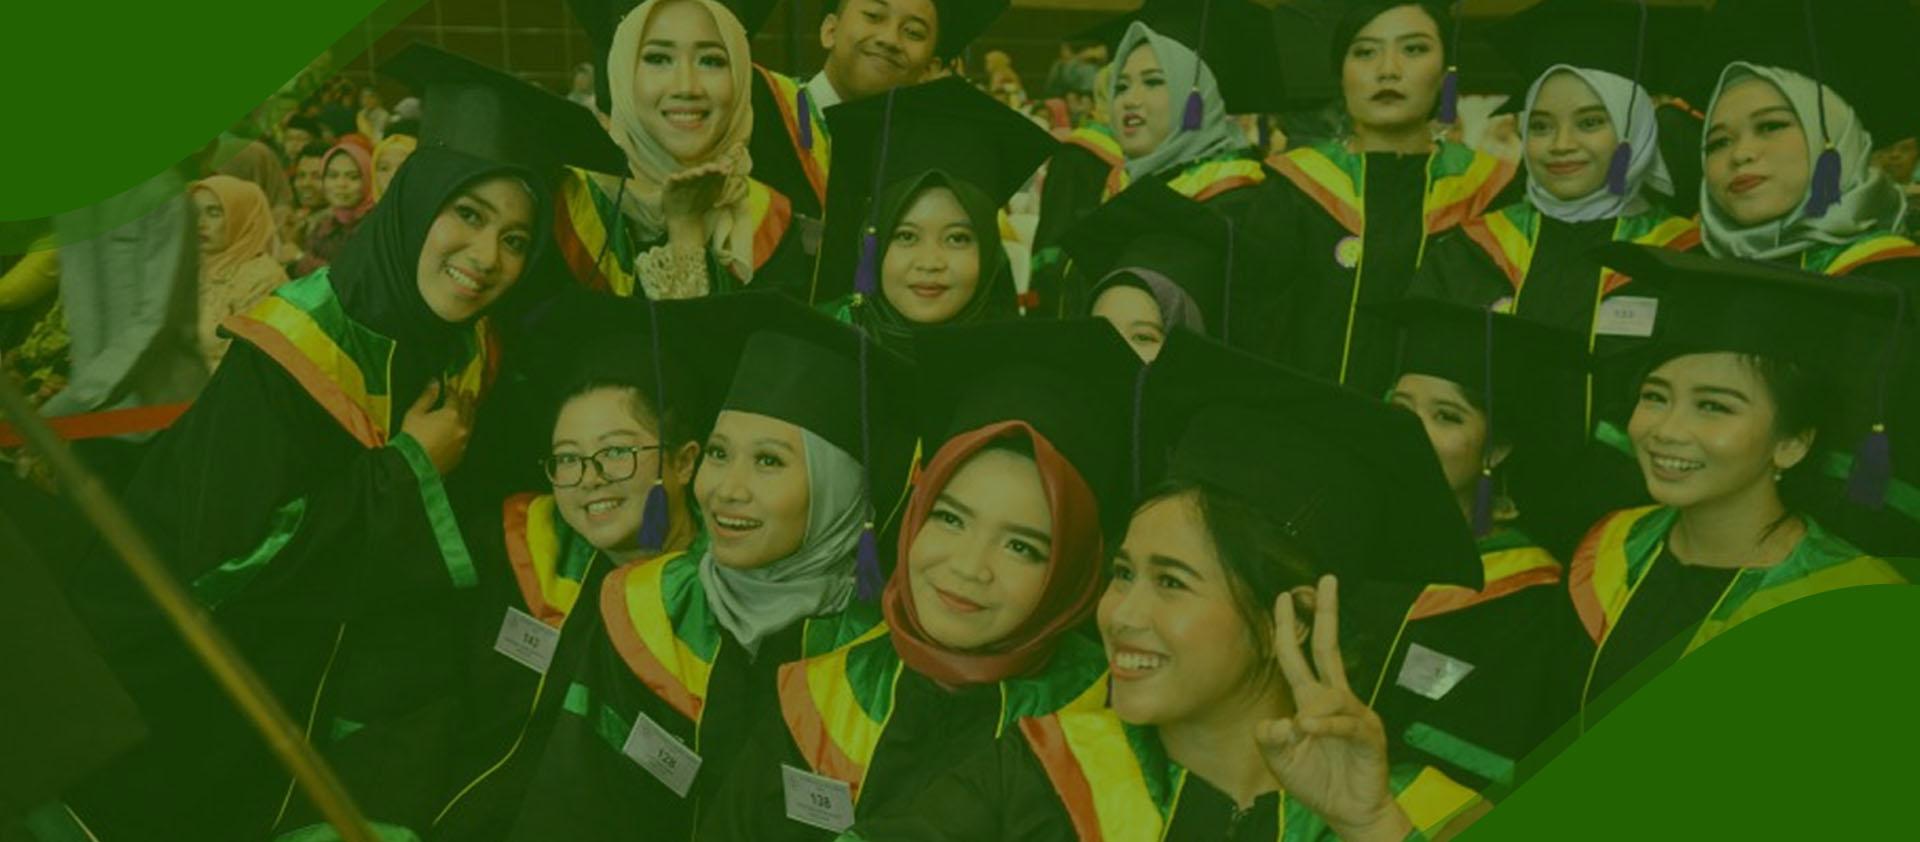 PENERIMAAN MAHASISWA BARU PASCASARJANA UNIVERSITAS NEGERI JAKARTA